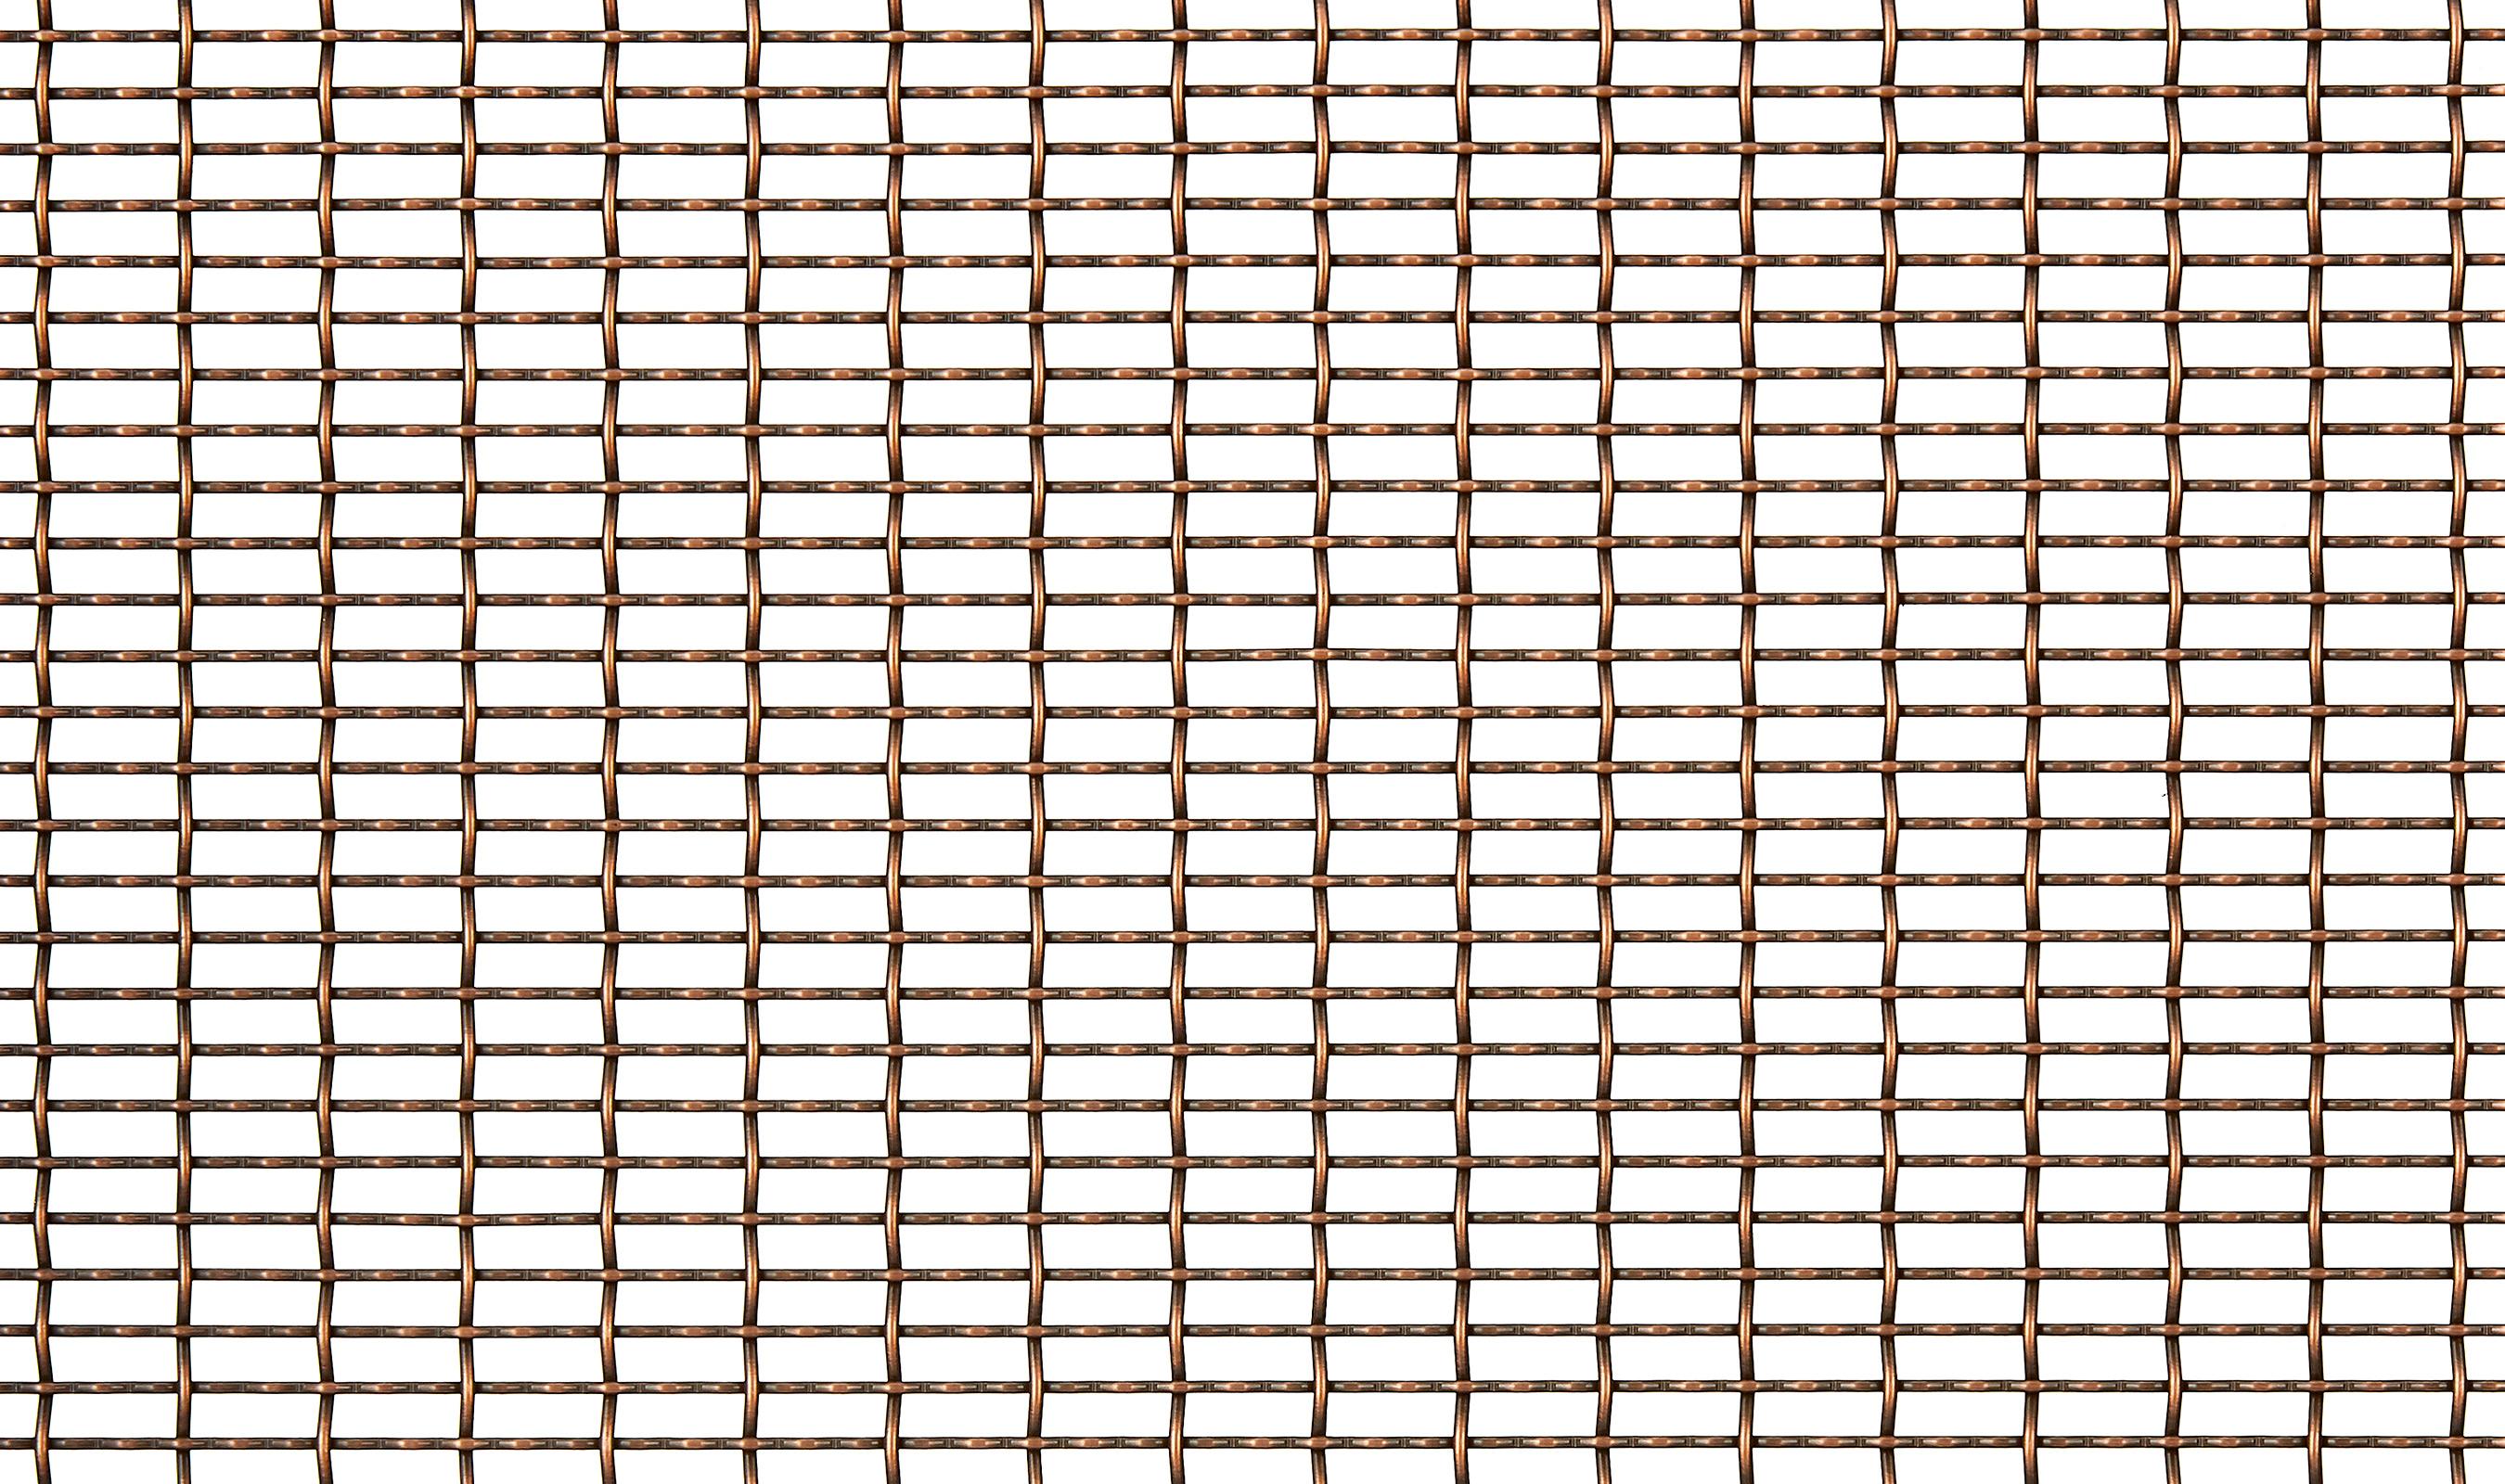 IPZ-33 Antique Copper Plated decorative wire mesh pattern